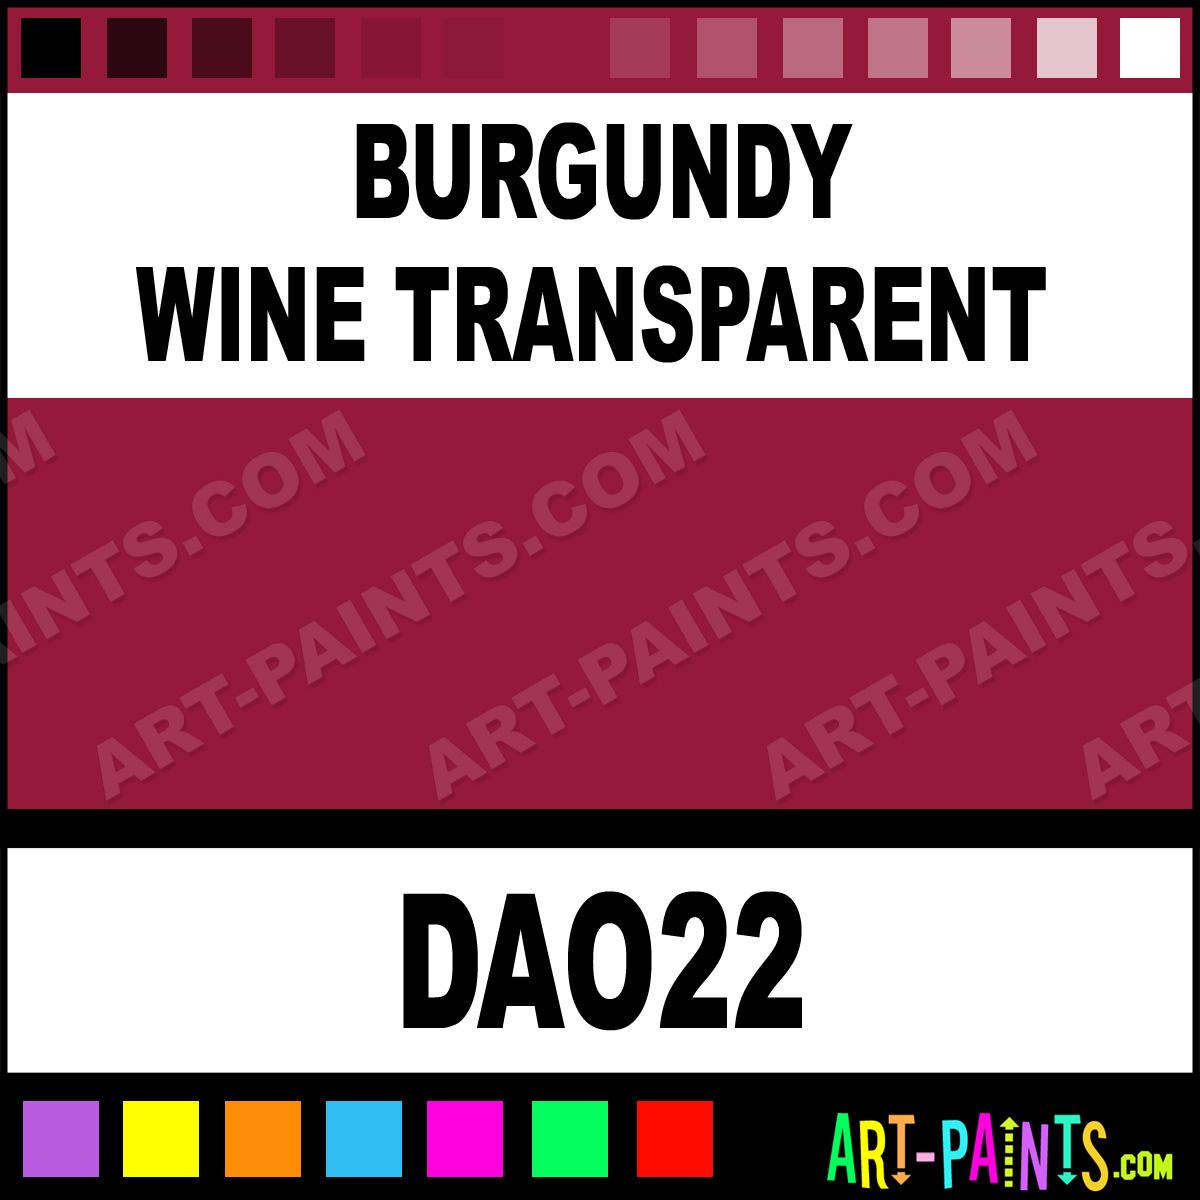 Burgundy wine transparent decoart acrylic paints dao22 for Burgundy paint color samples